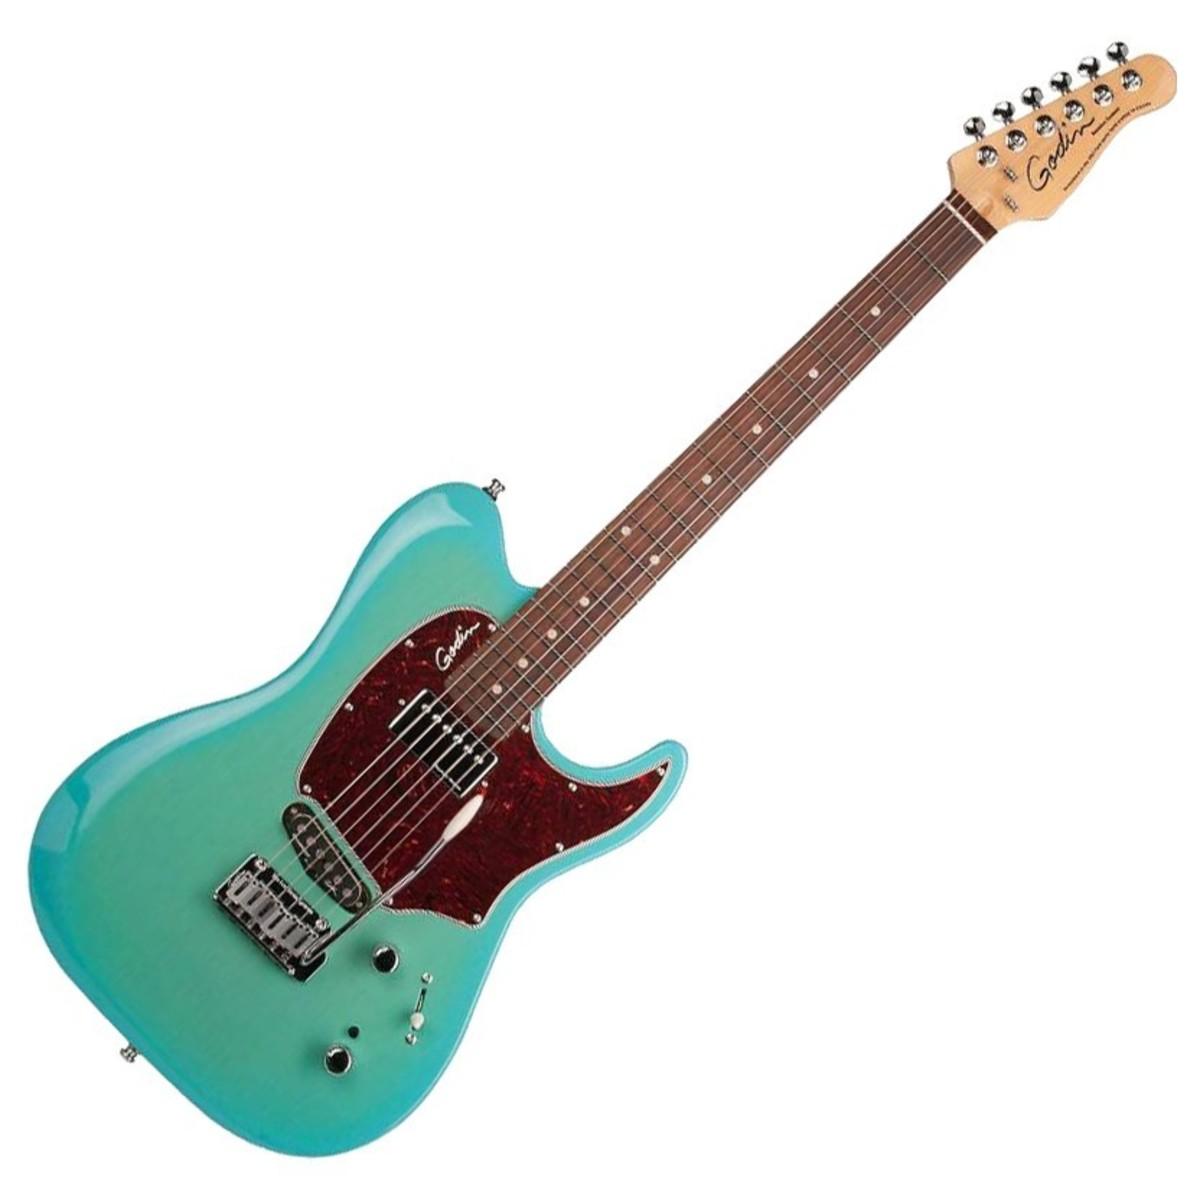 godin session custom 59 rw limited coral blue at gear4music. Black Bedroom Furniture Sets. Home Design Ideas